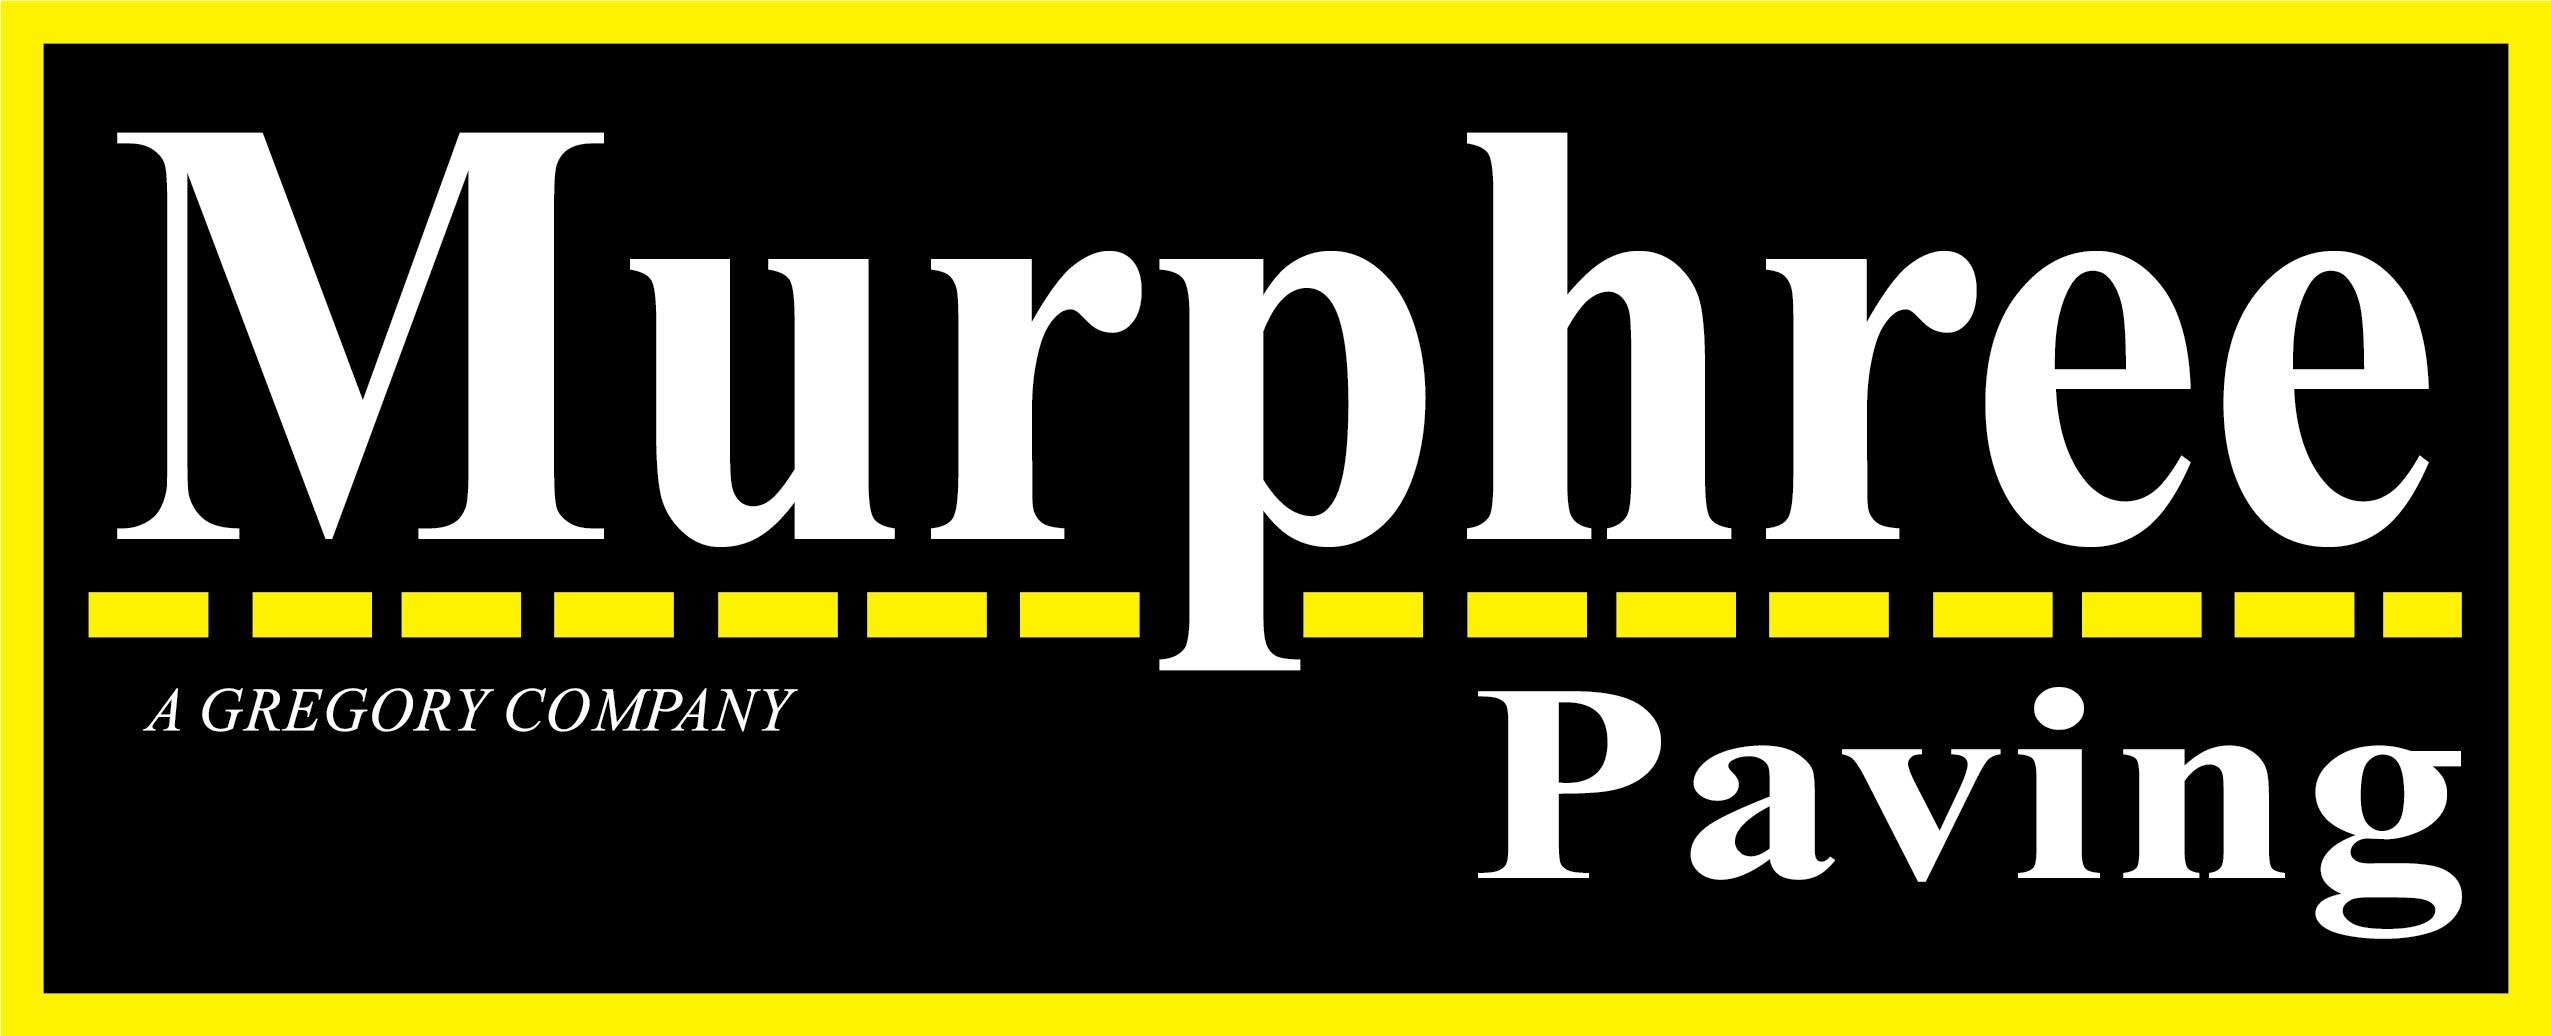 Murphree Pavement